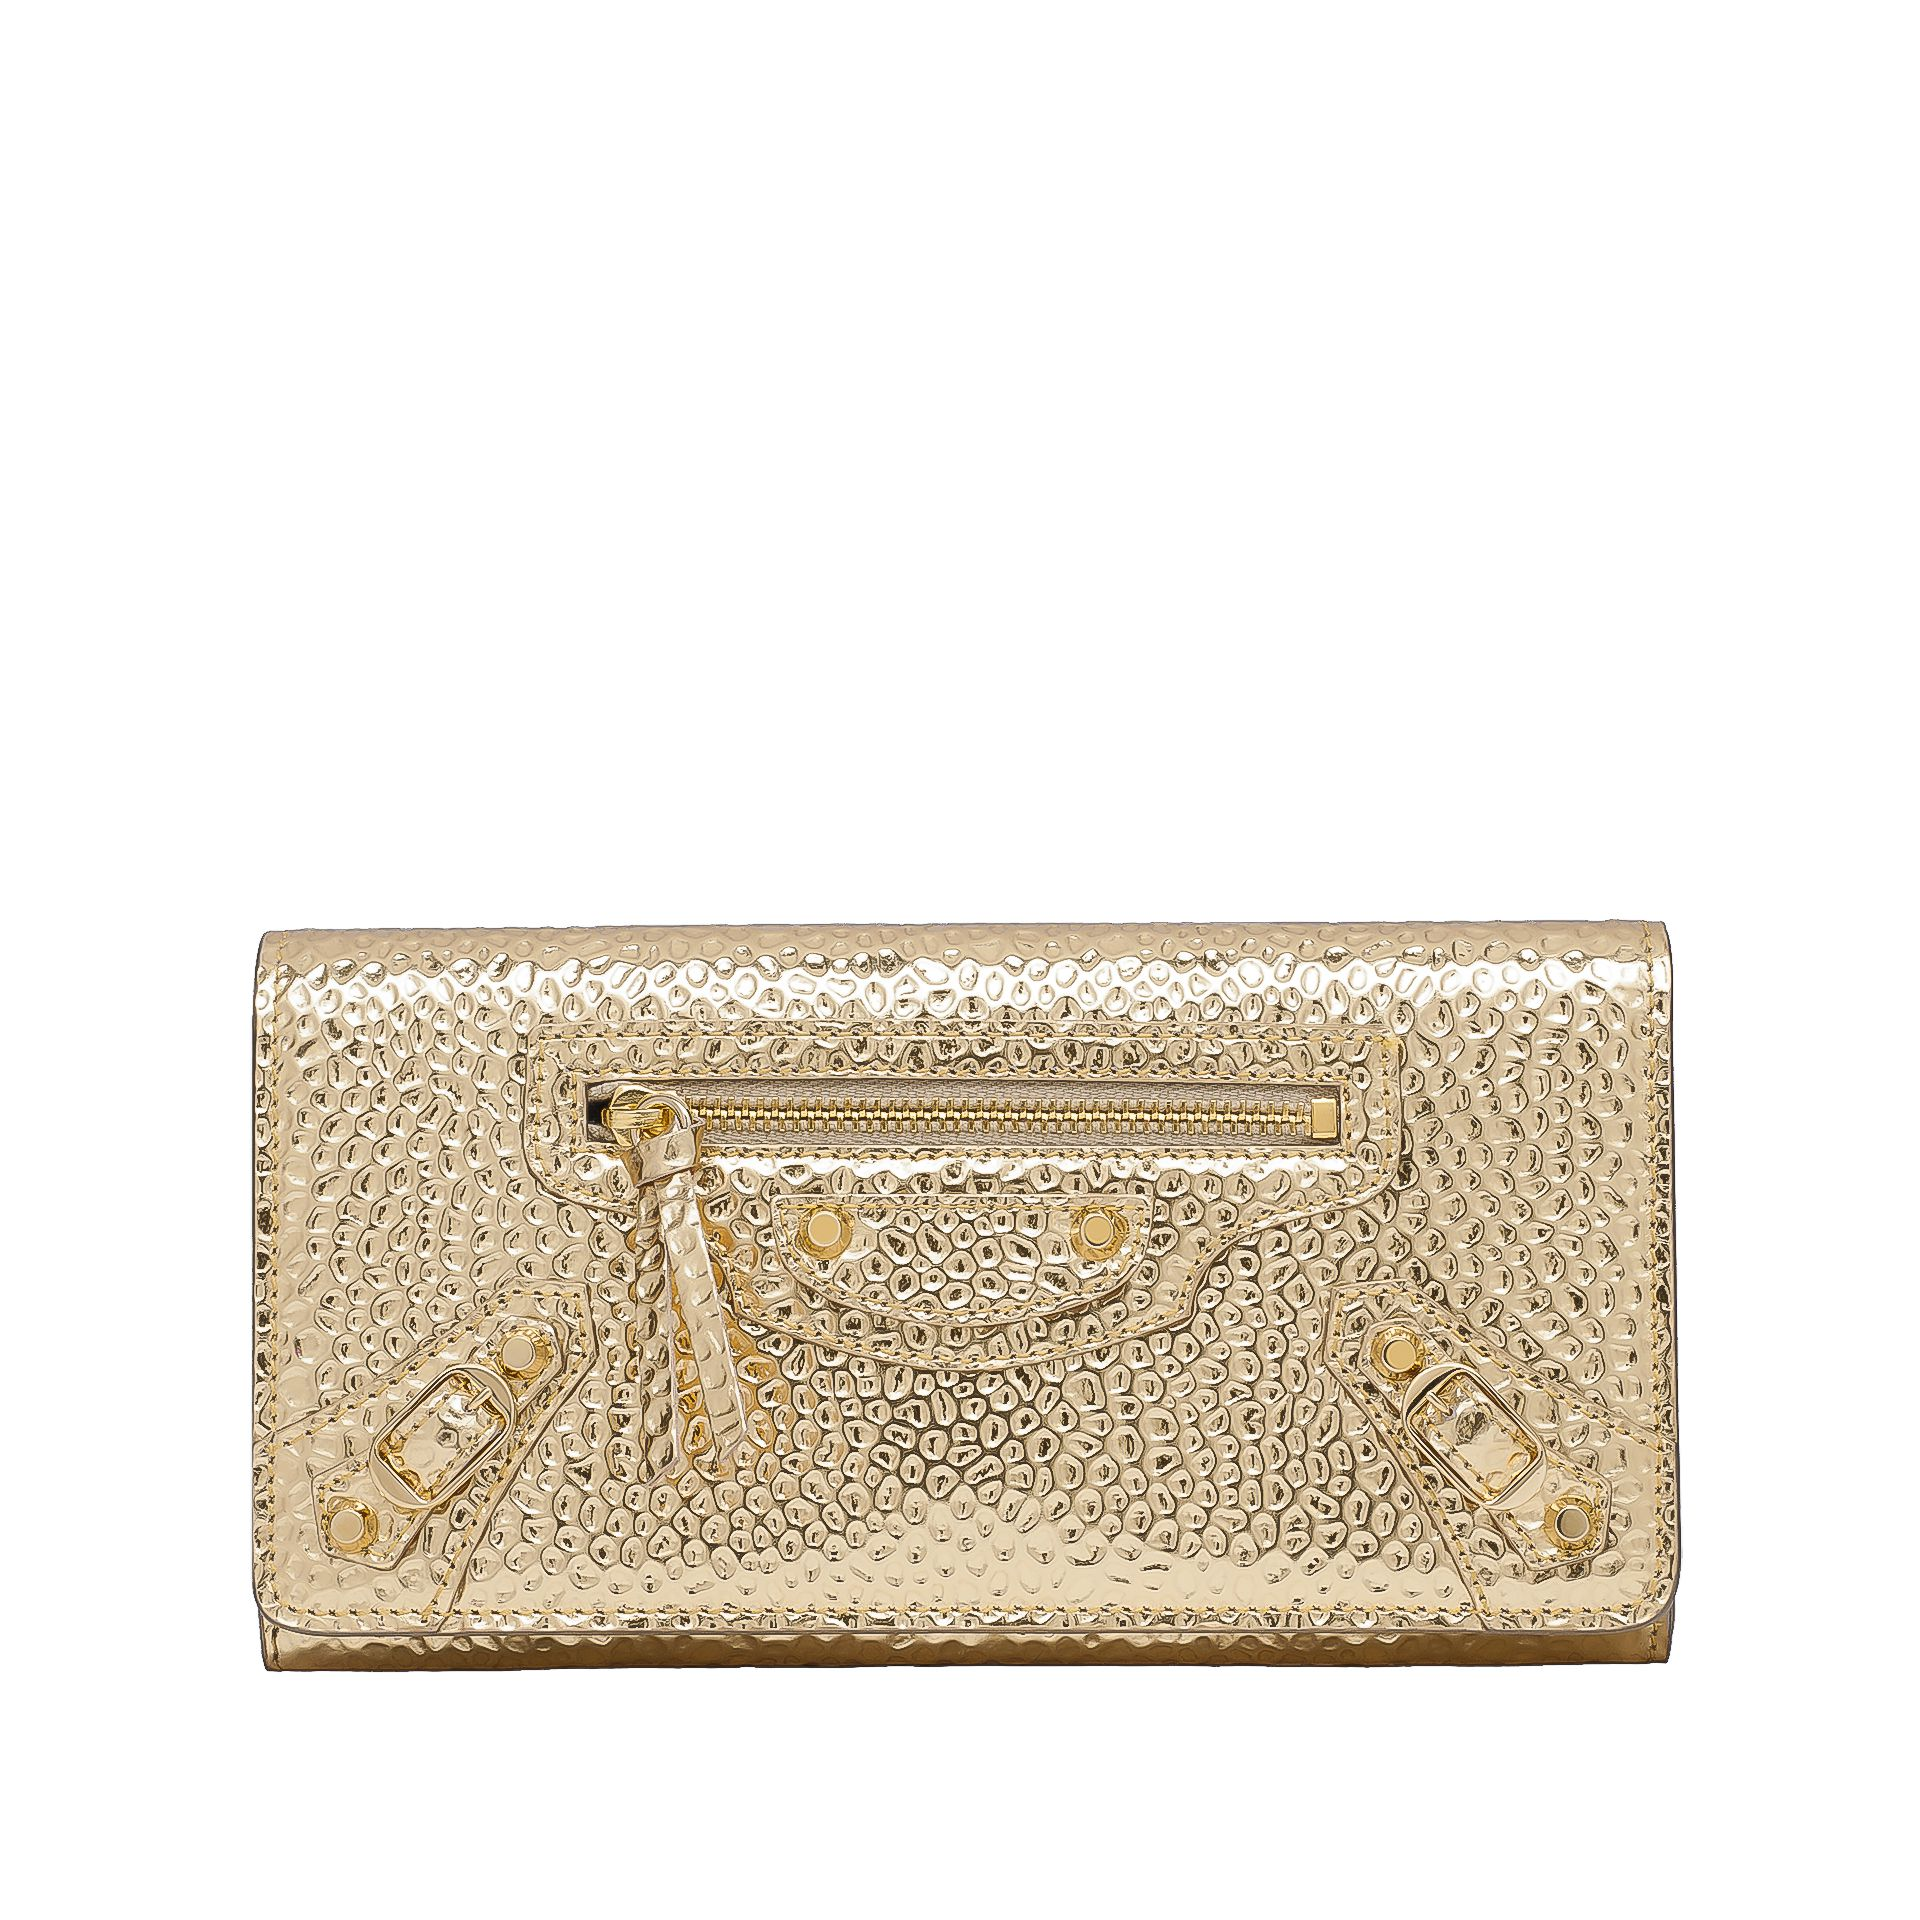 BALENCIAGA Balenciaga Classic Money Valentine's Day  Wallet D f